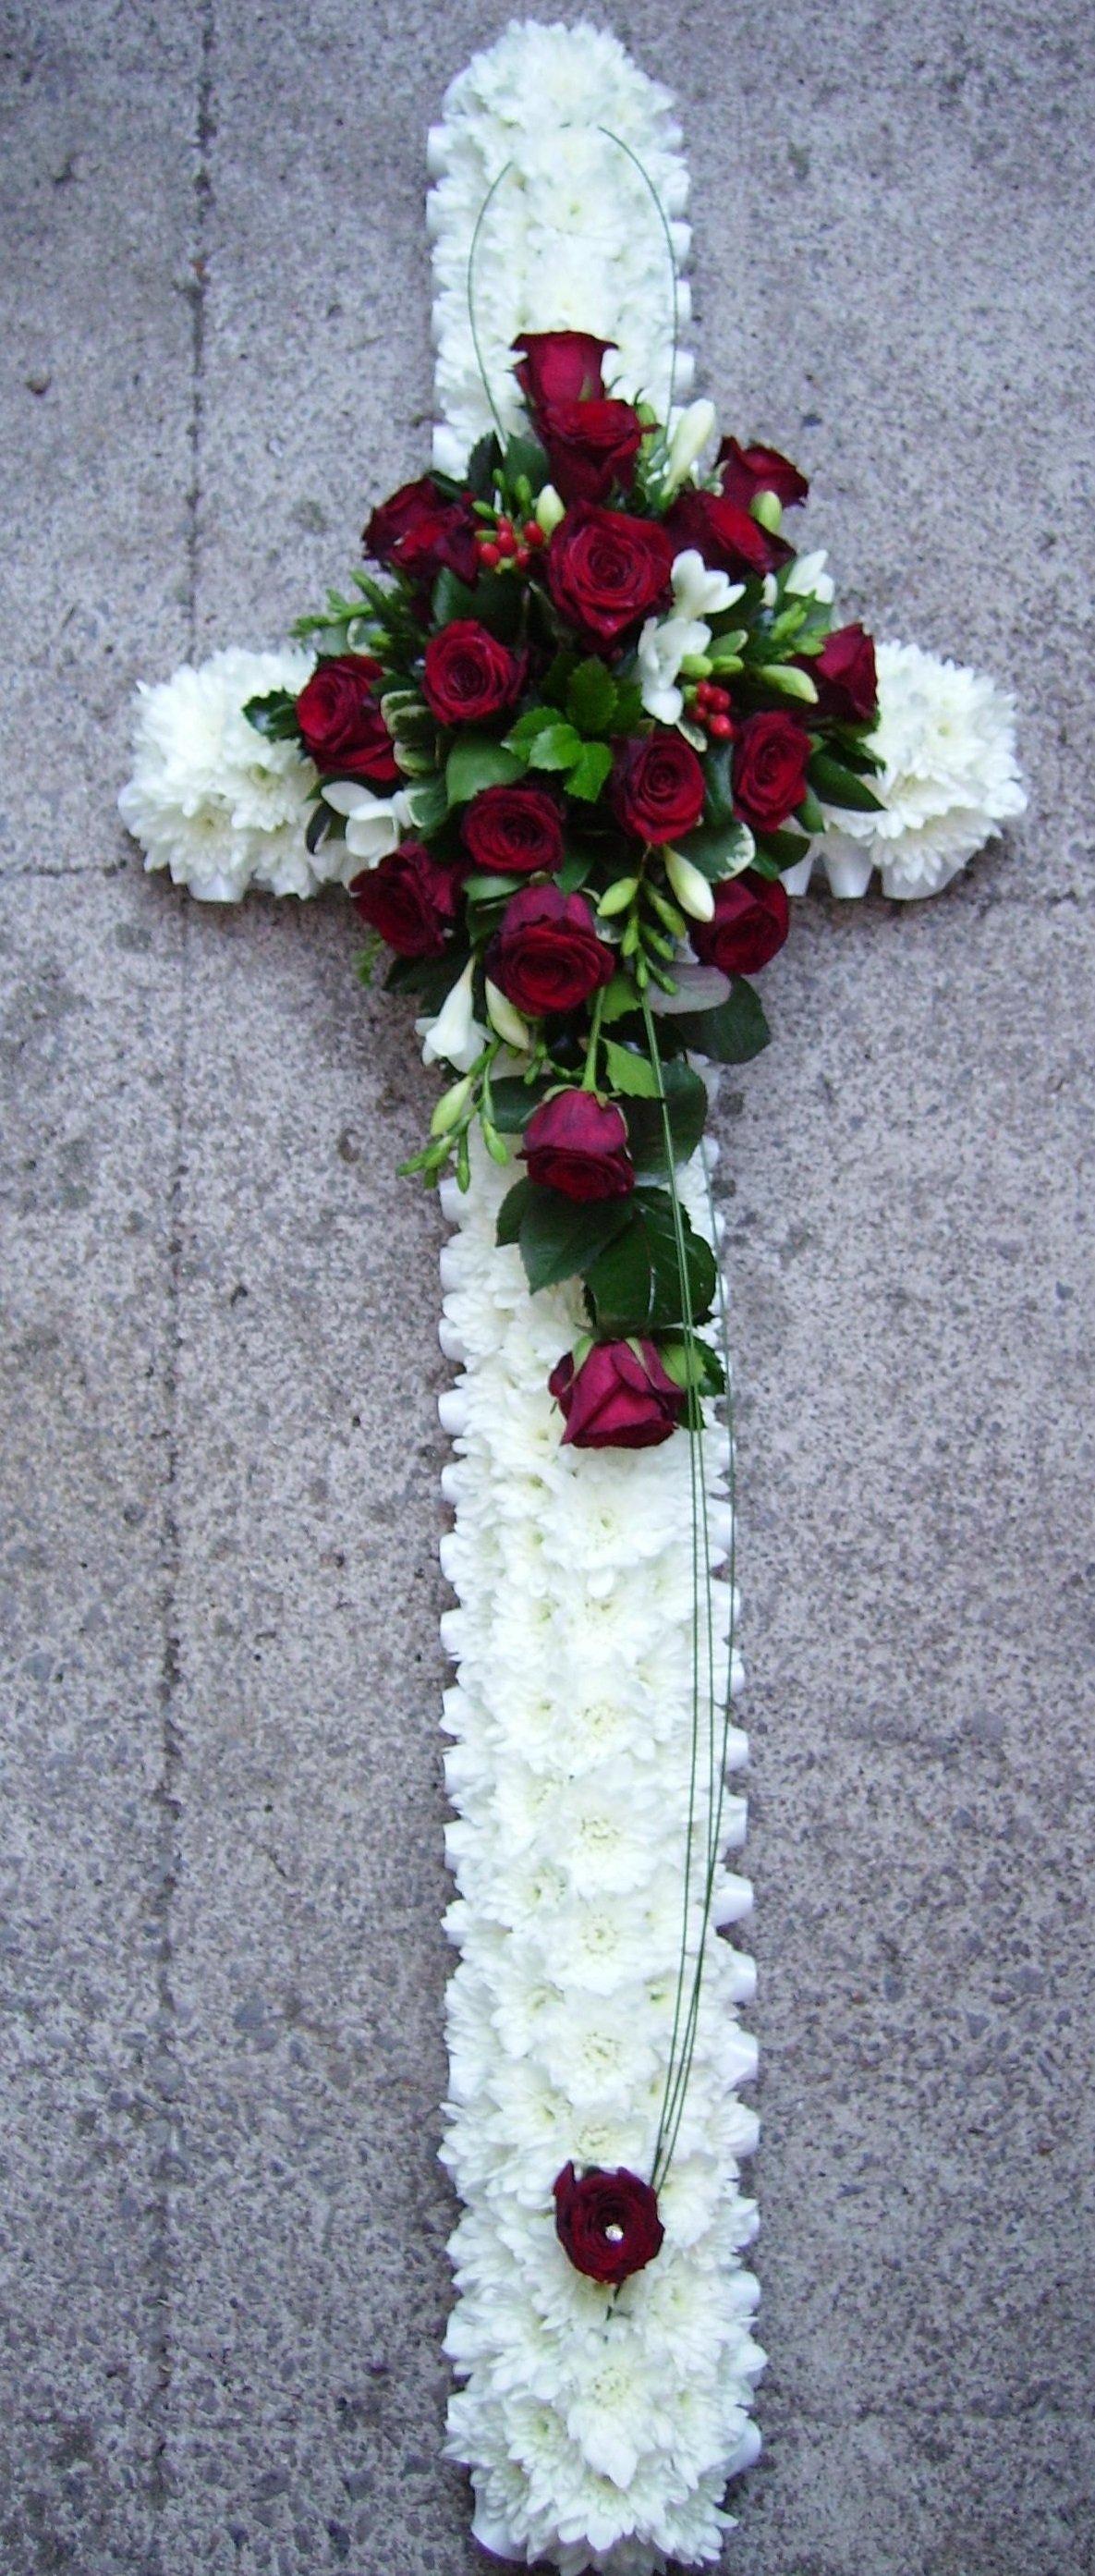 Flower arrangements for funeral displays in bristol view all izmirmasajfo